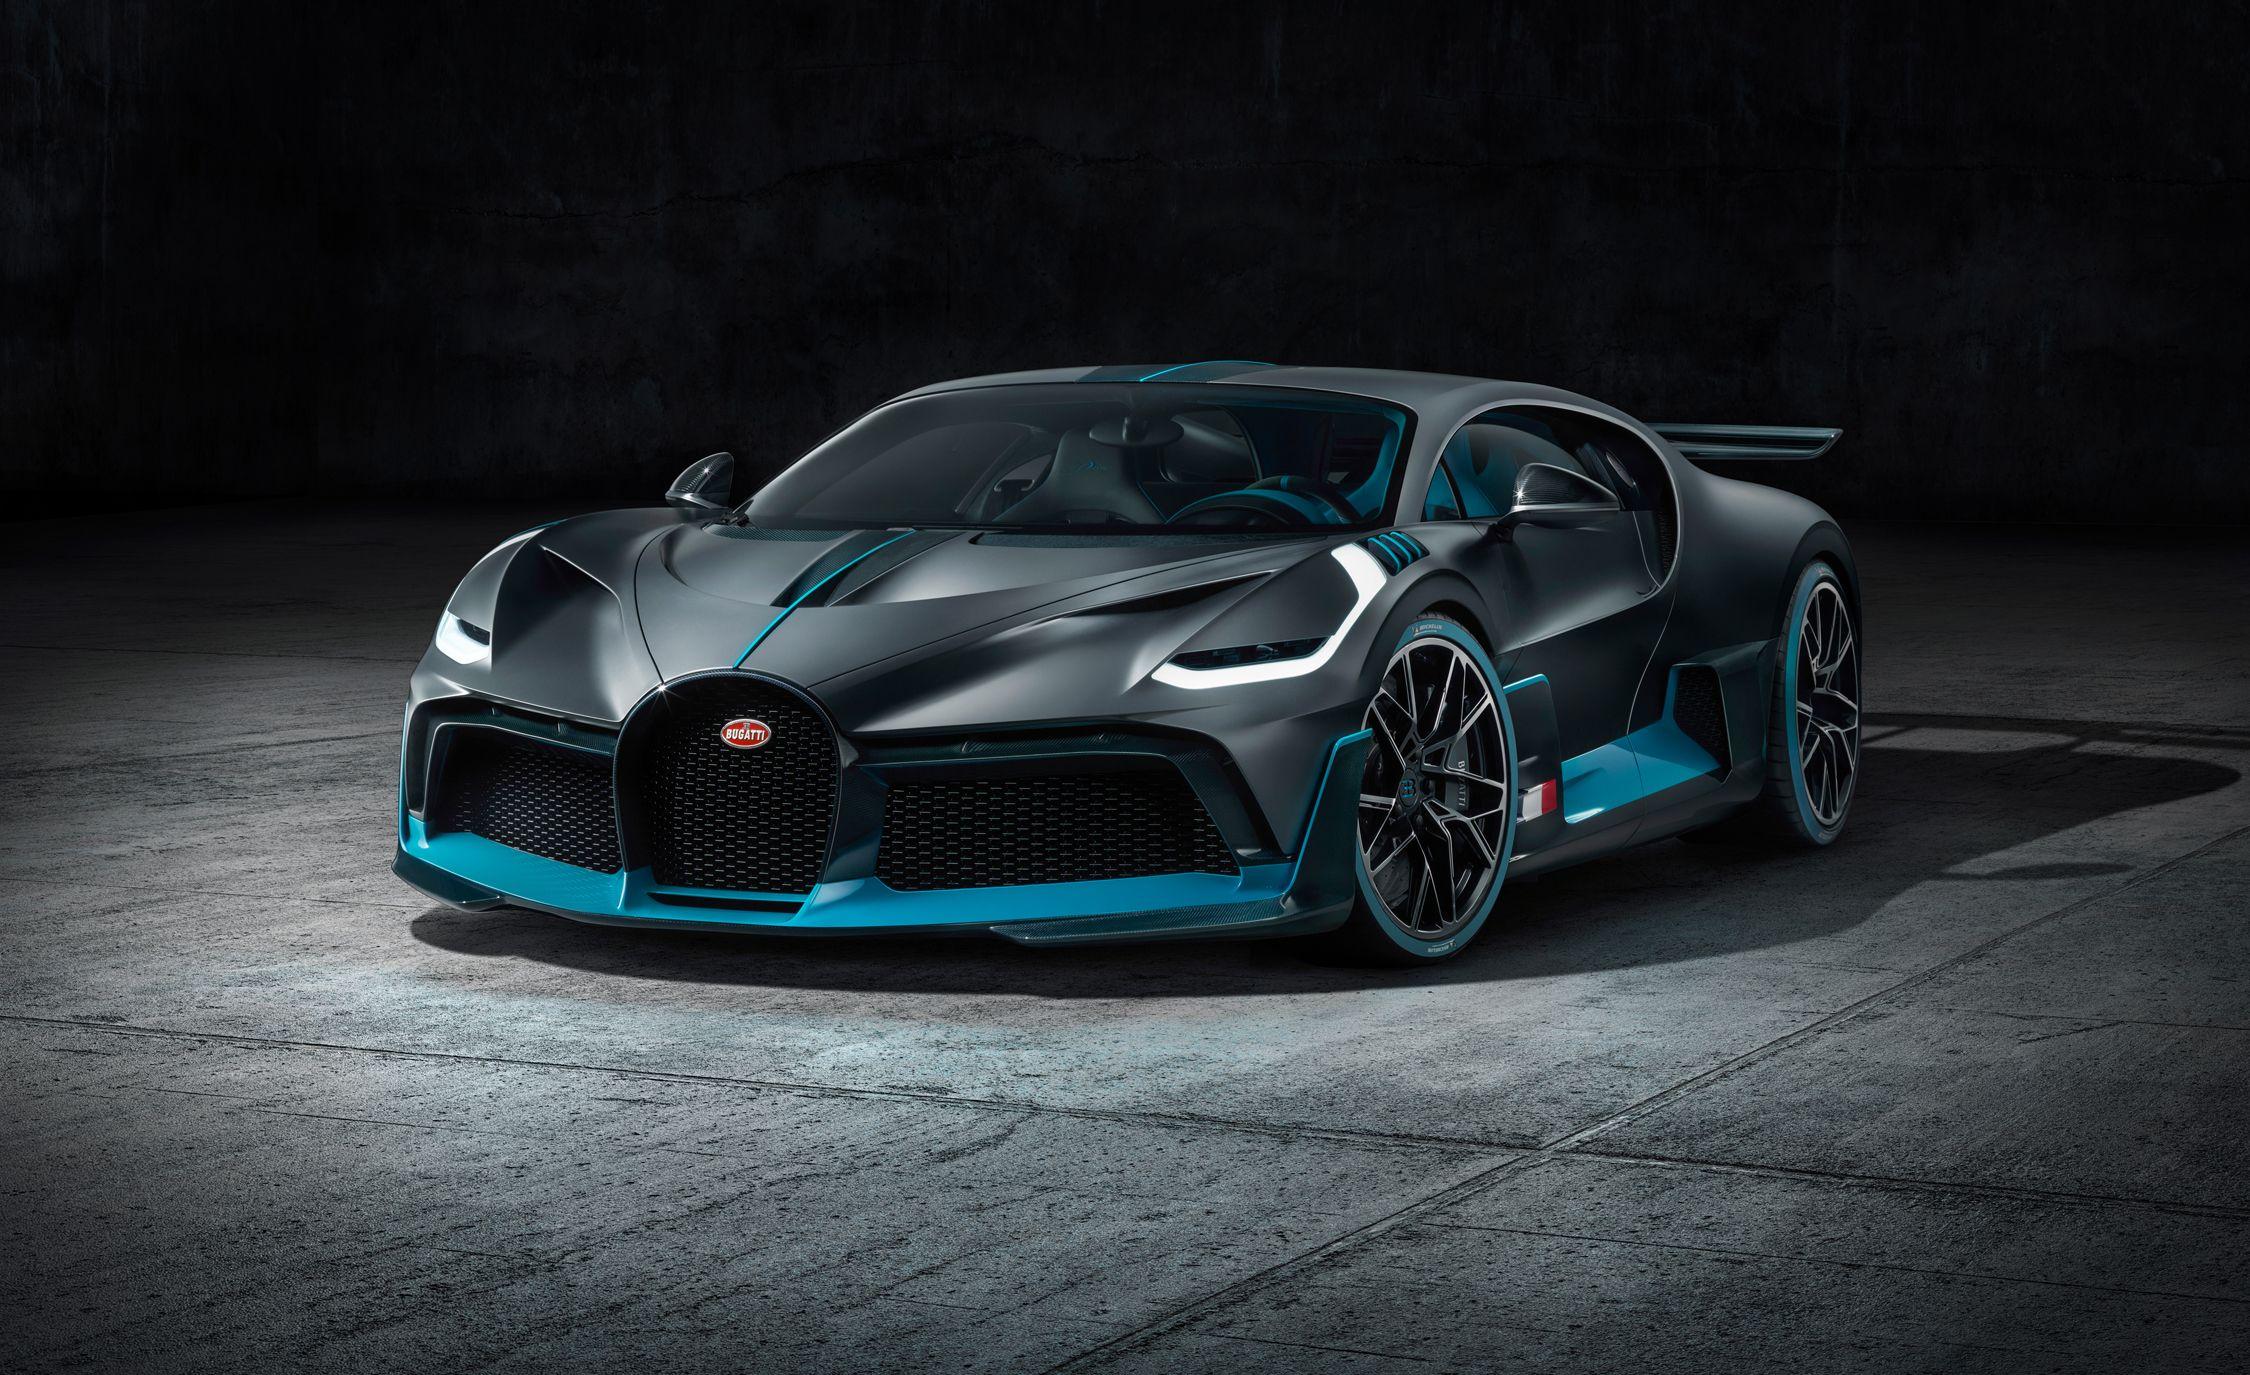 The $5.8 Million Bugatti Divo Is a Lighter, Wilder, Better-Handling Chiron